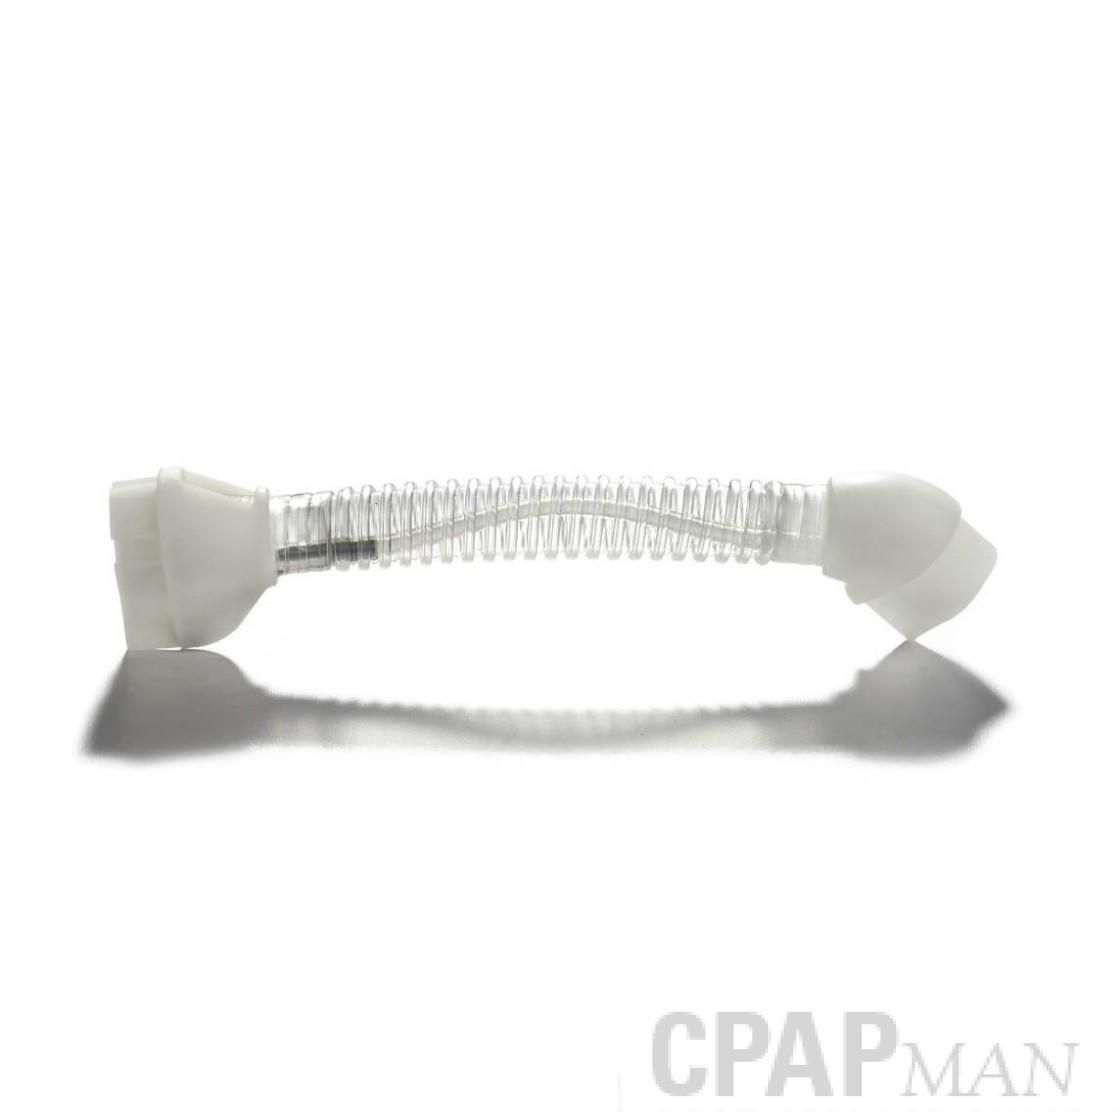 Hose for Transcend H9M CPAP, 9 inch